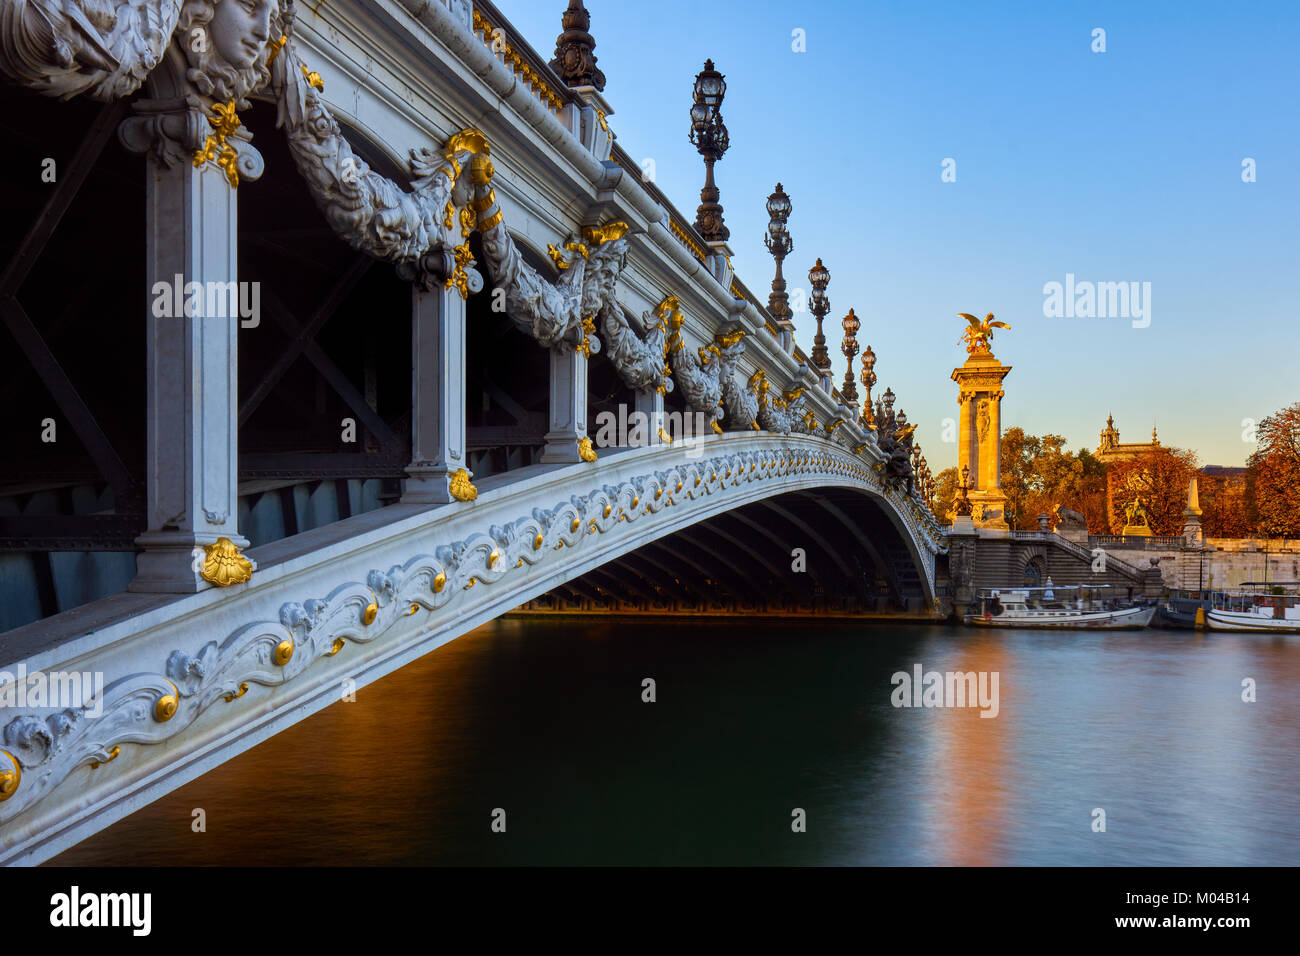 Pont Alexandre III bridge and Seine River at sunset. 8th Arrondissement, Paris, France - Stock Image